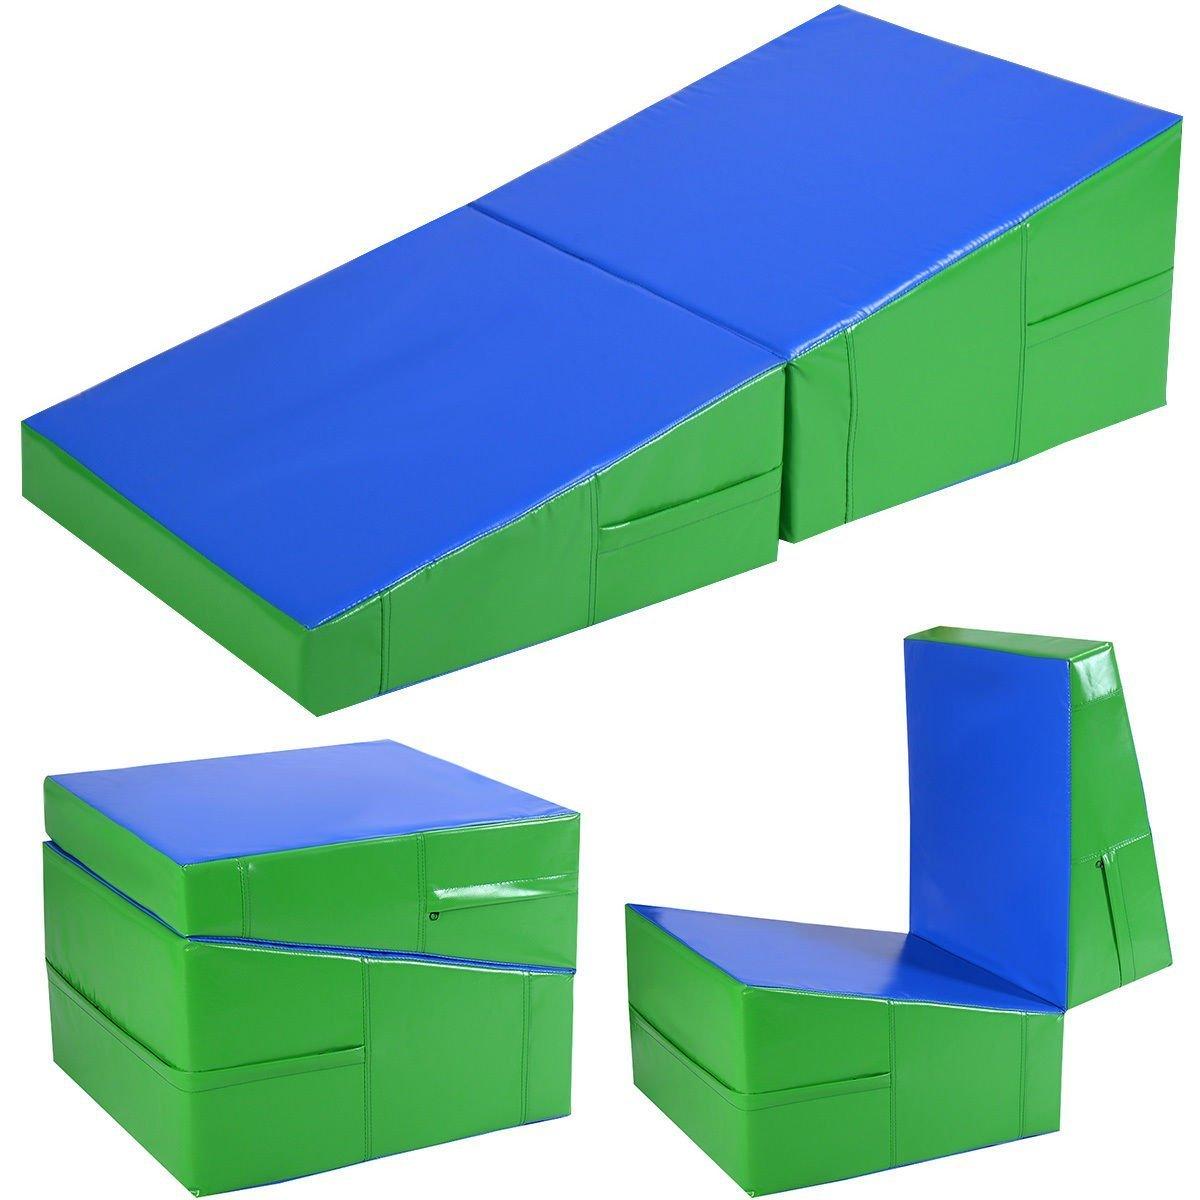 tumbling triangle gymnastics mats shape wedge skill large mat cheese detail incline ramp product folding